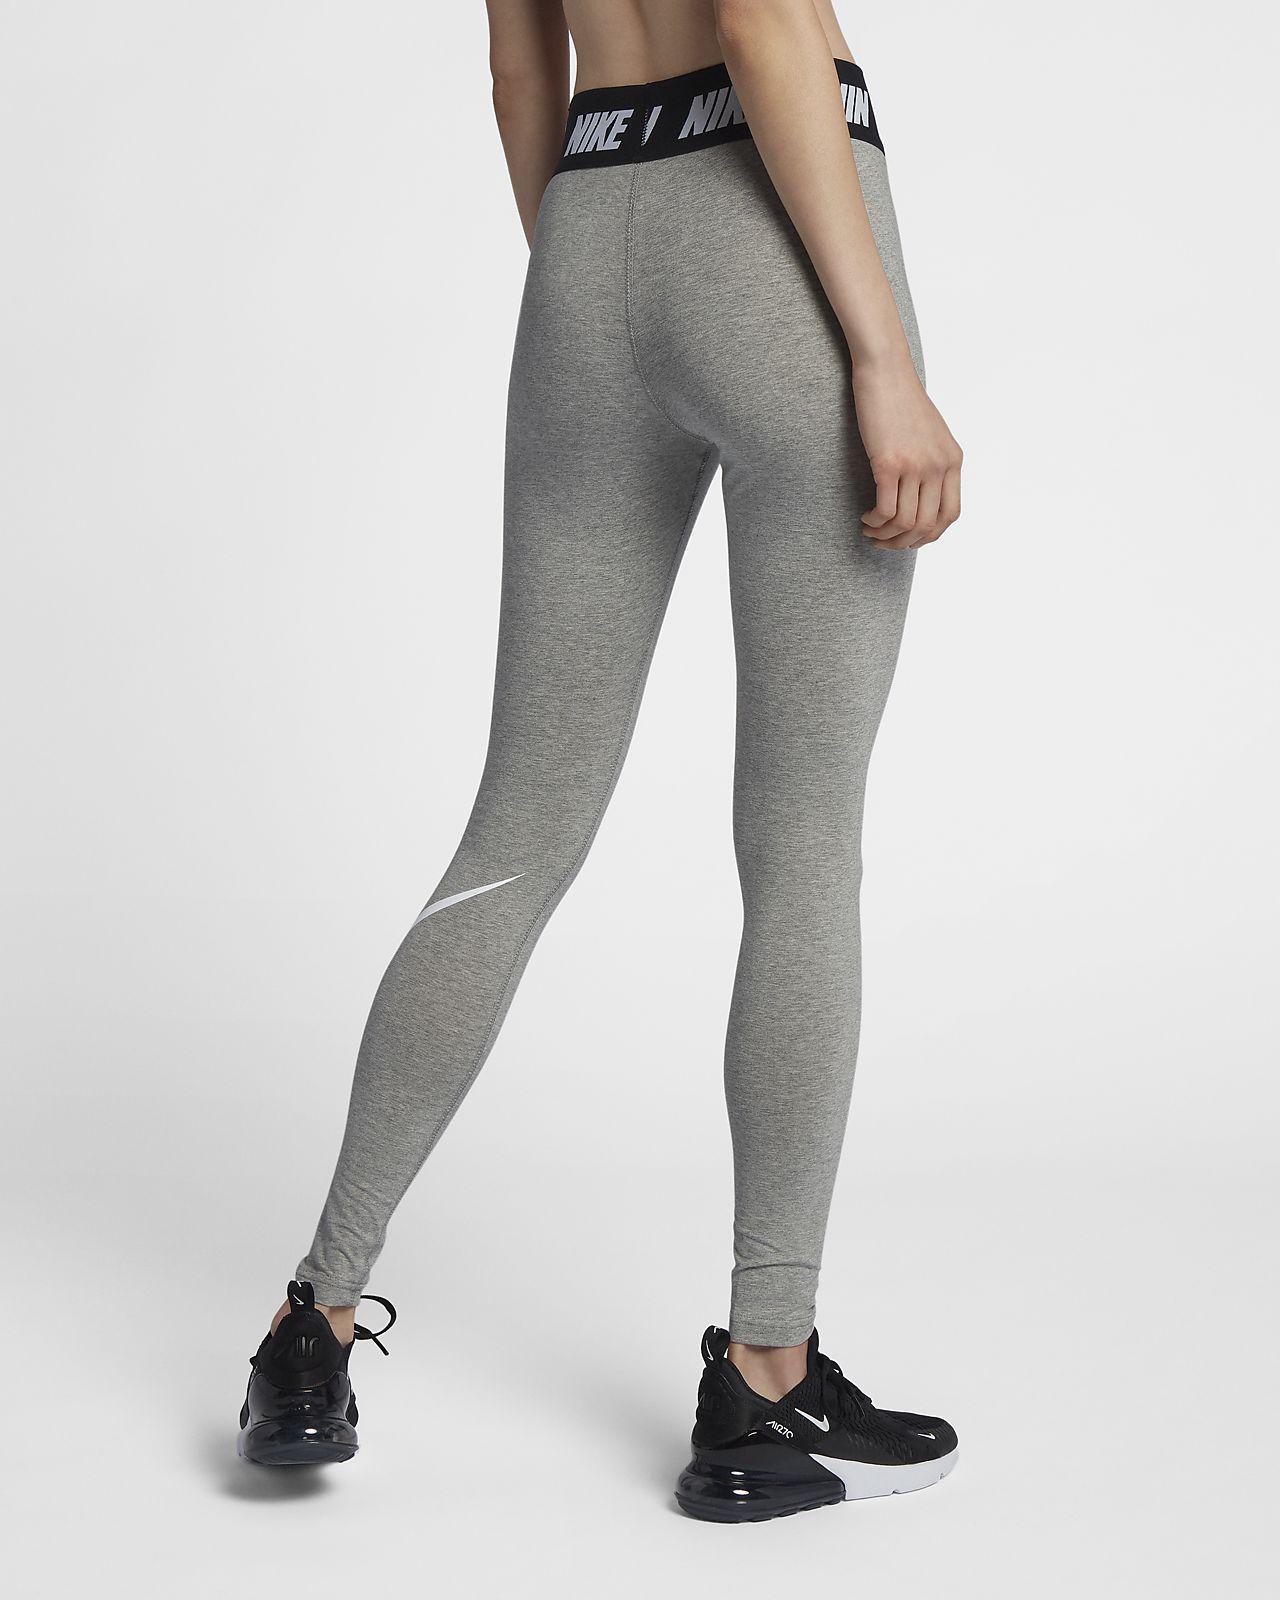 Nike Sportswear Club Women's High Rise Leggings